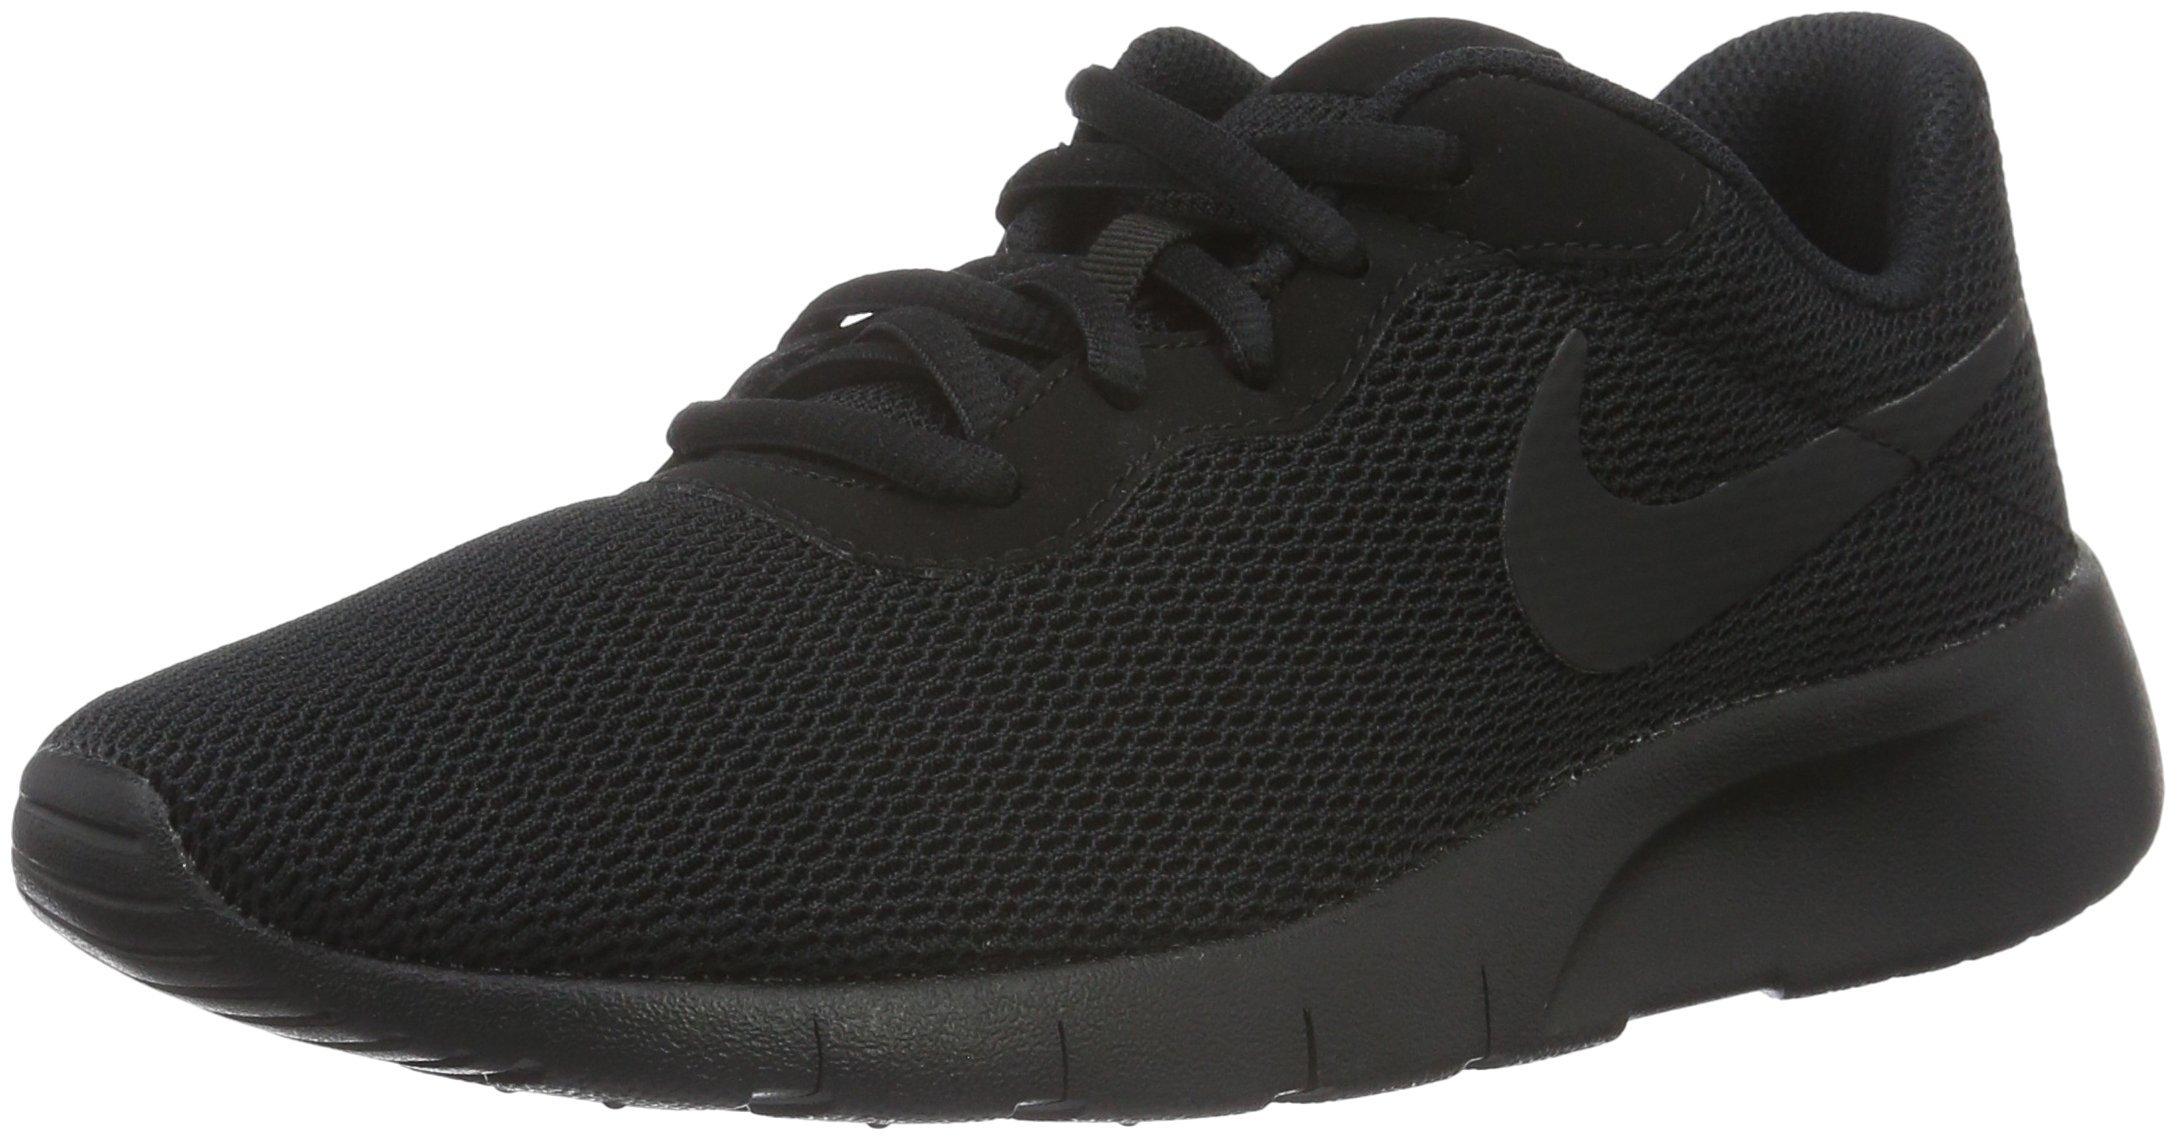 buy popular 71f79 e55ec Galleon - Nike 818381-001  Big Kid s Tanjun Running Black Sneaker (7 M US  Big Kid, Black Black)